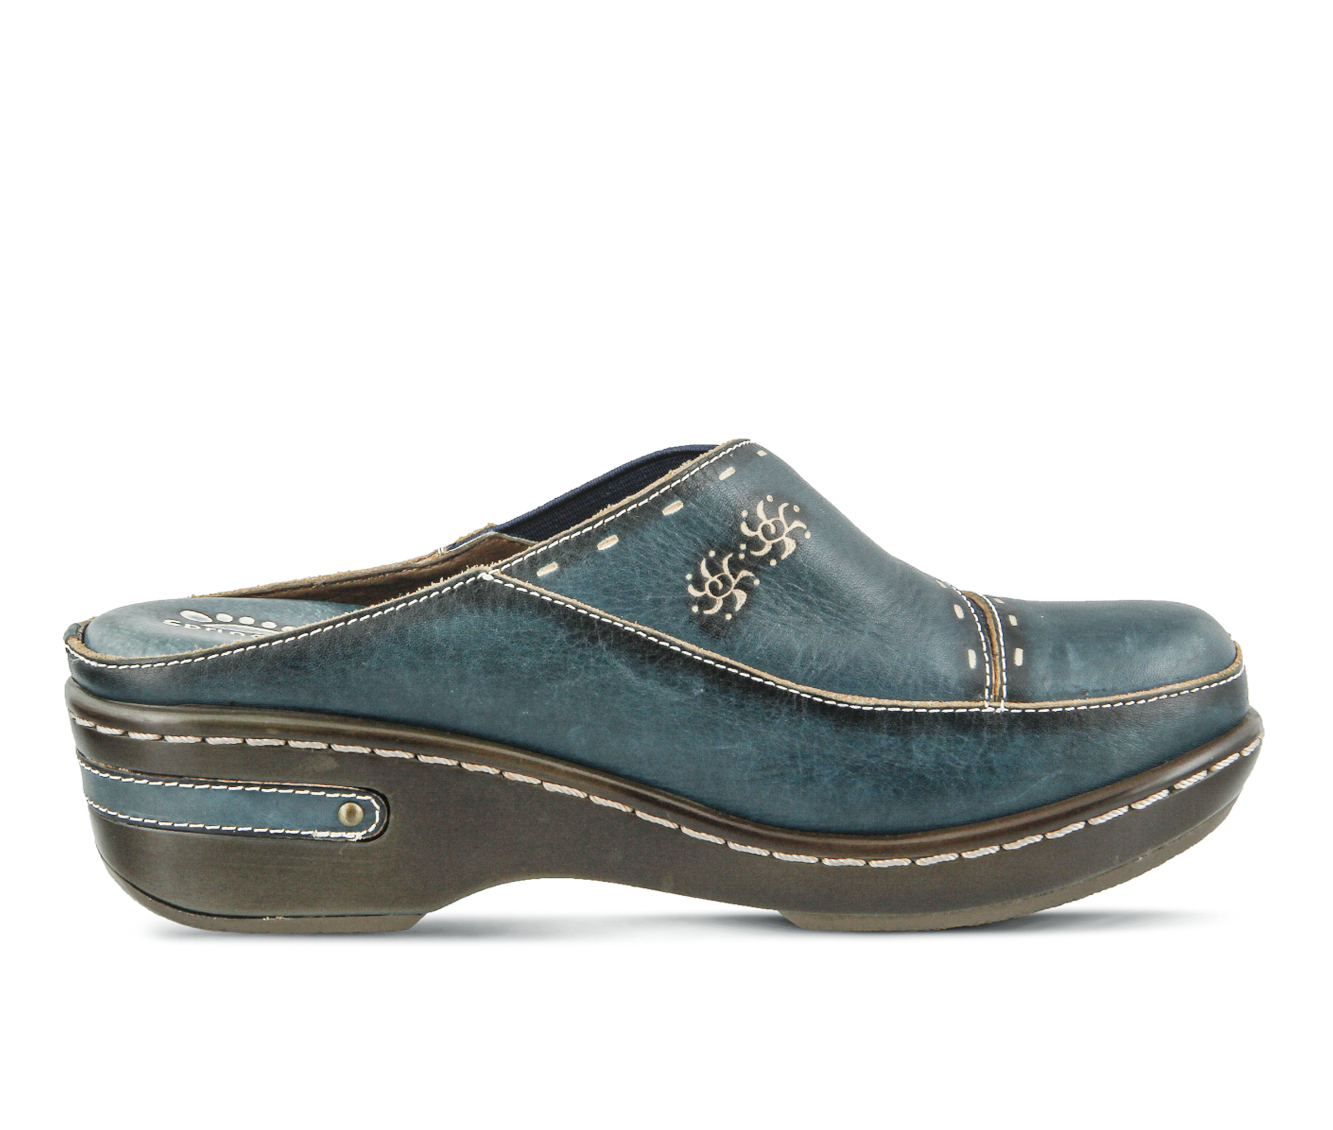 L'Artiste Chino Women's Shoe (Blue Leather)